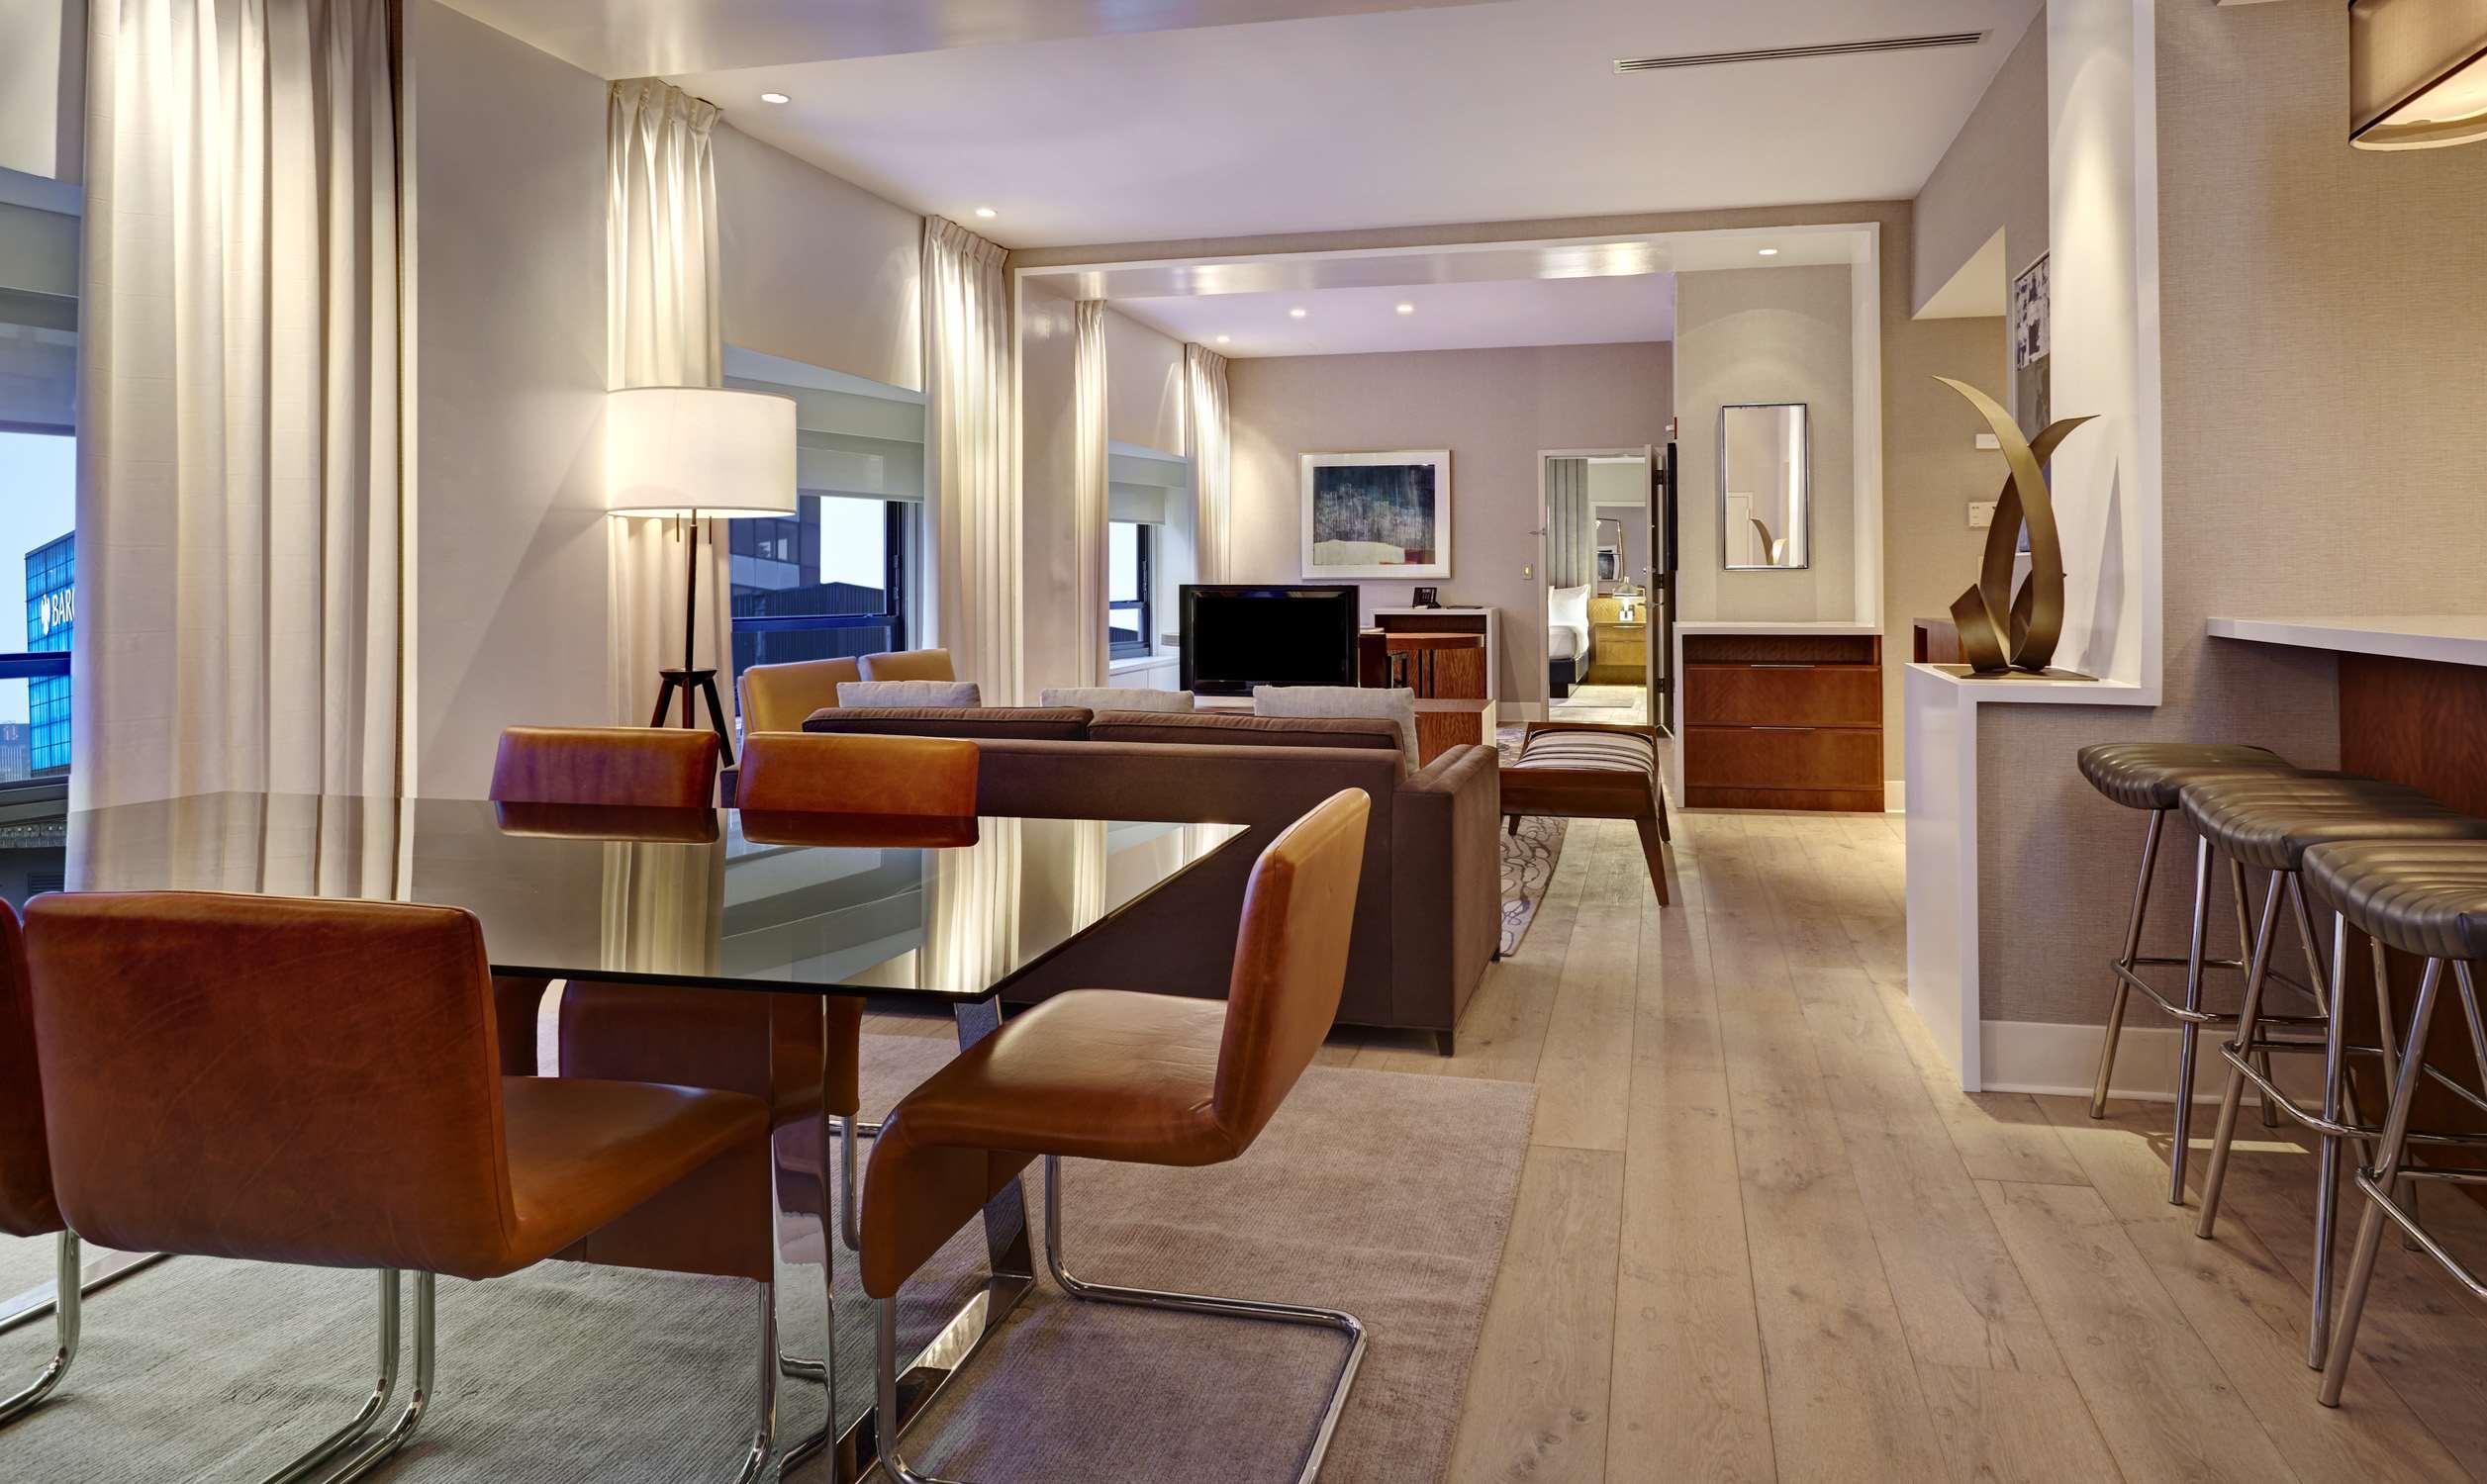 New York Hilton Midtown image 28